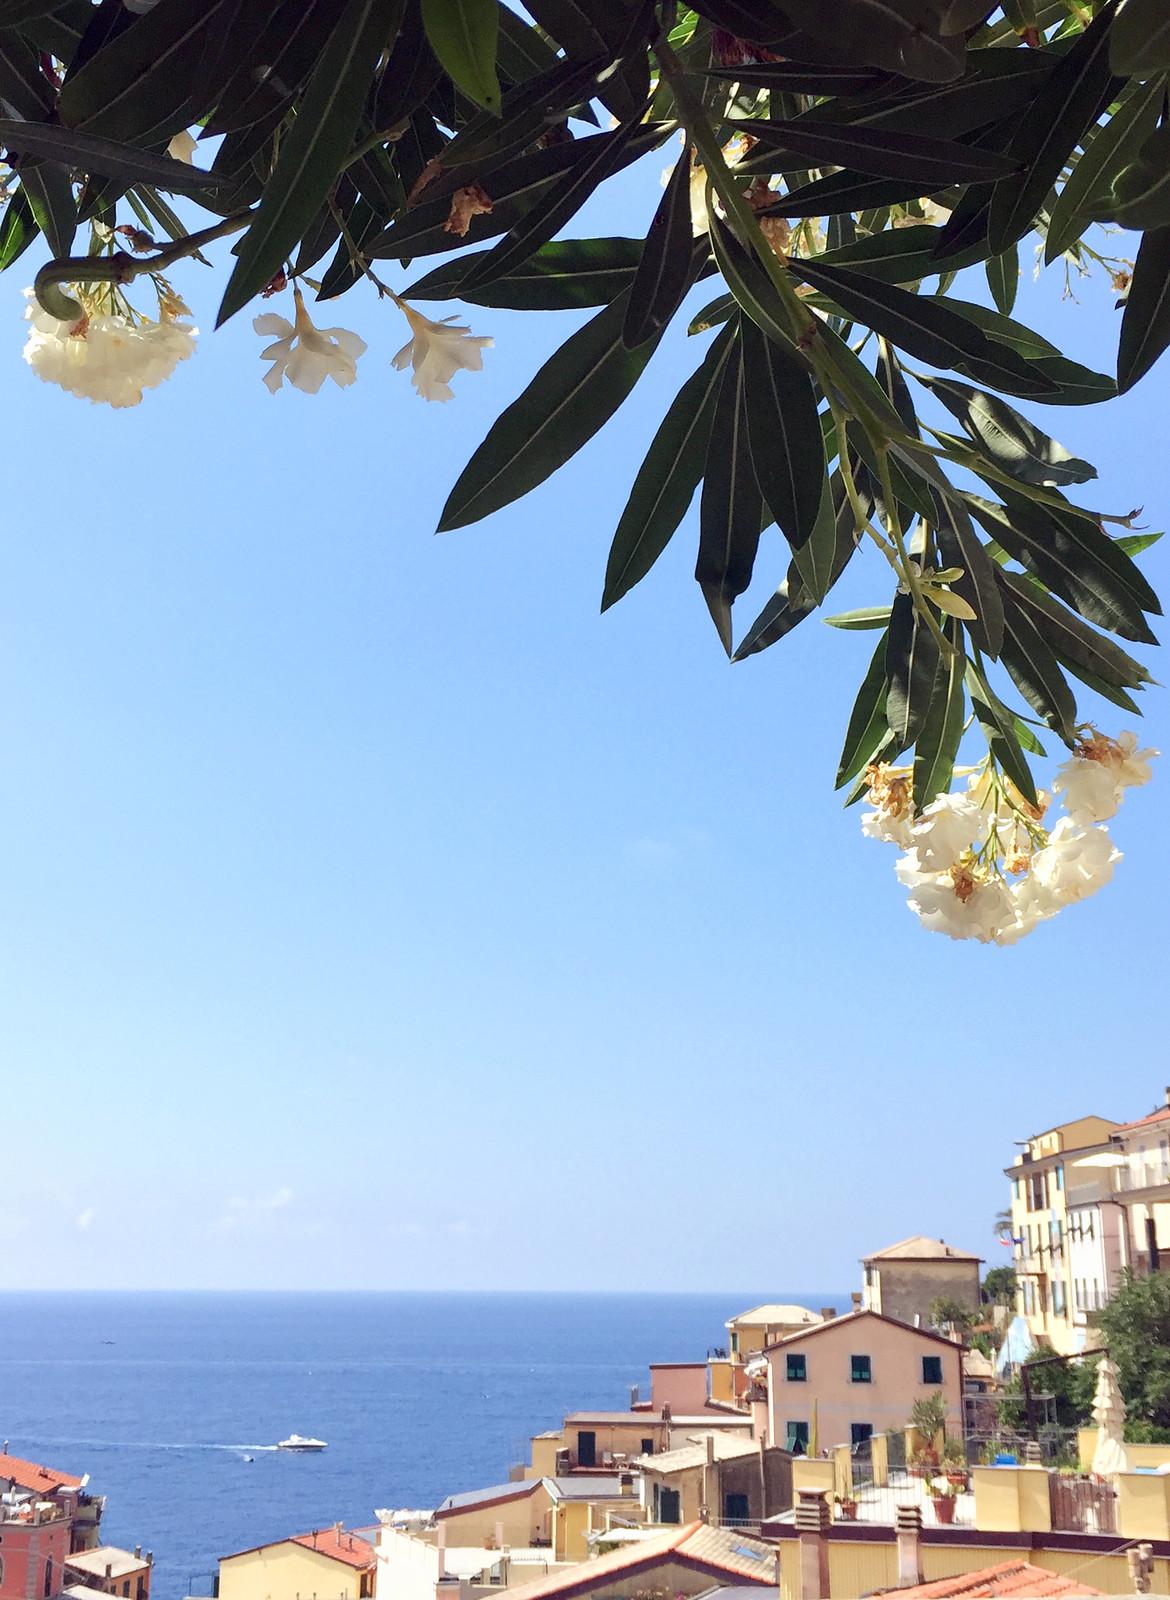 Cinque Terre Riomaggiore flowers and houses